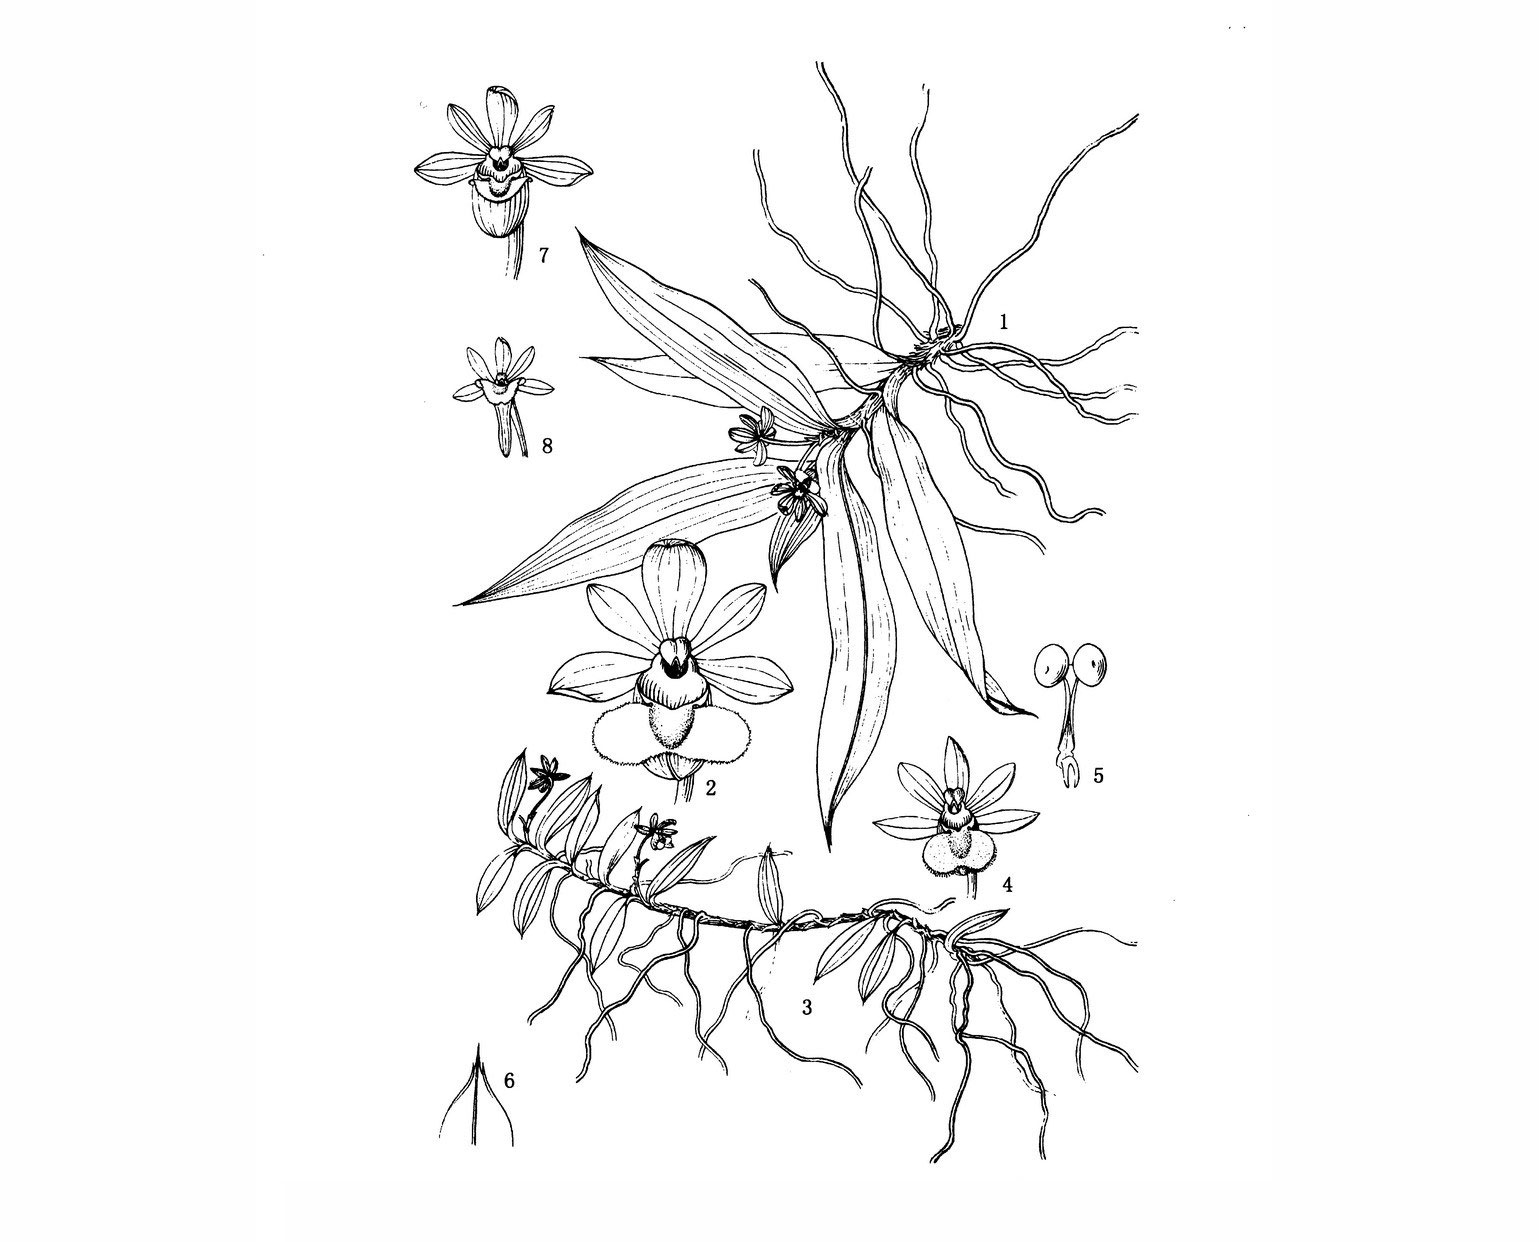 狭叶盆距兰Gastrochilus linearifolius Z. H. Tsi et Garay